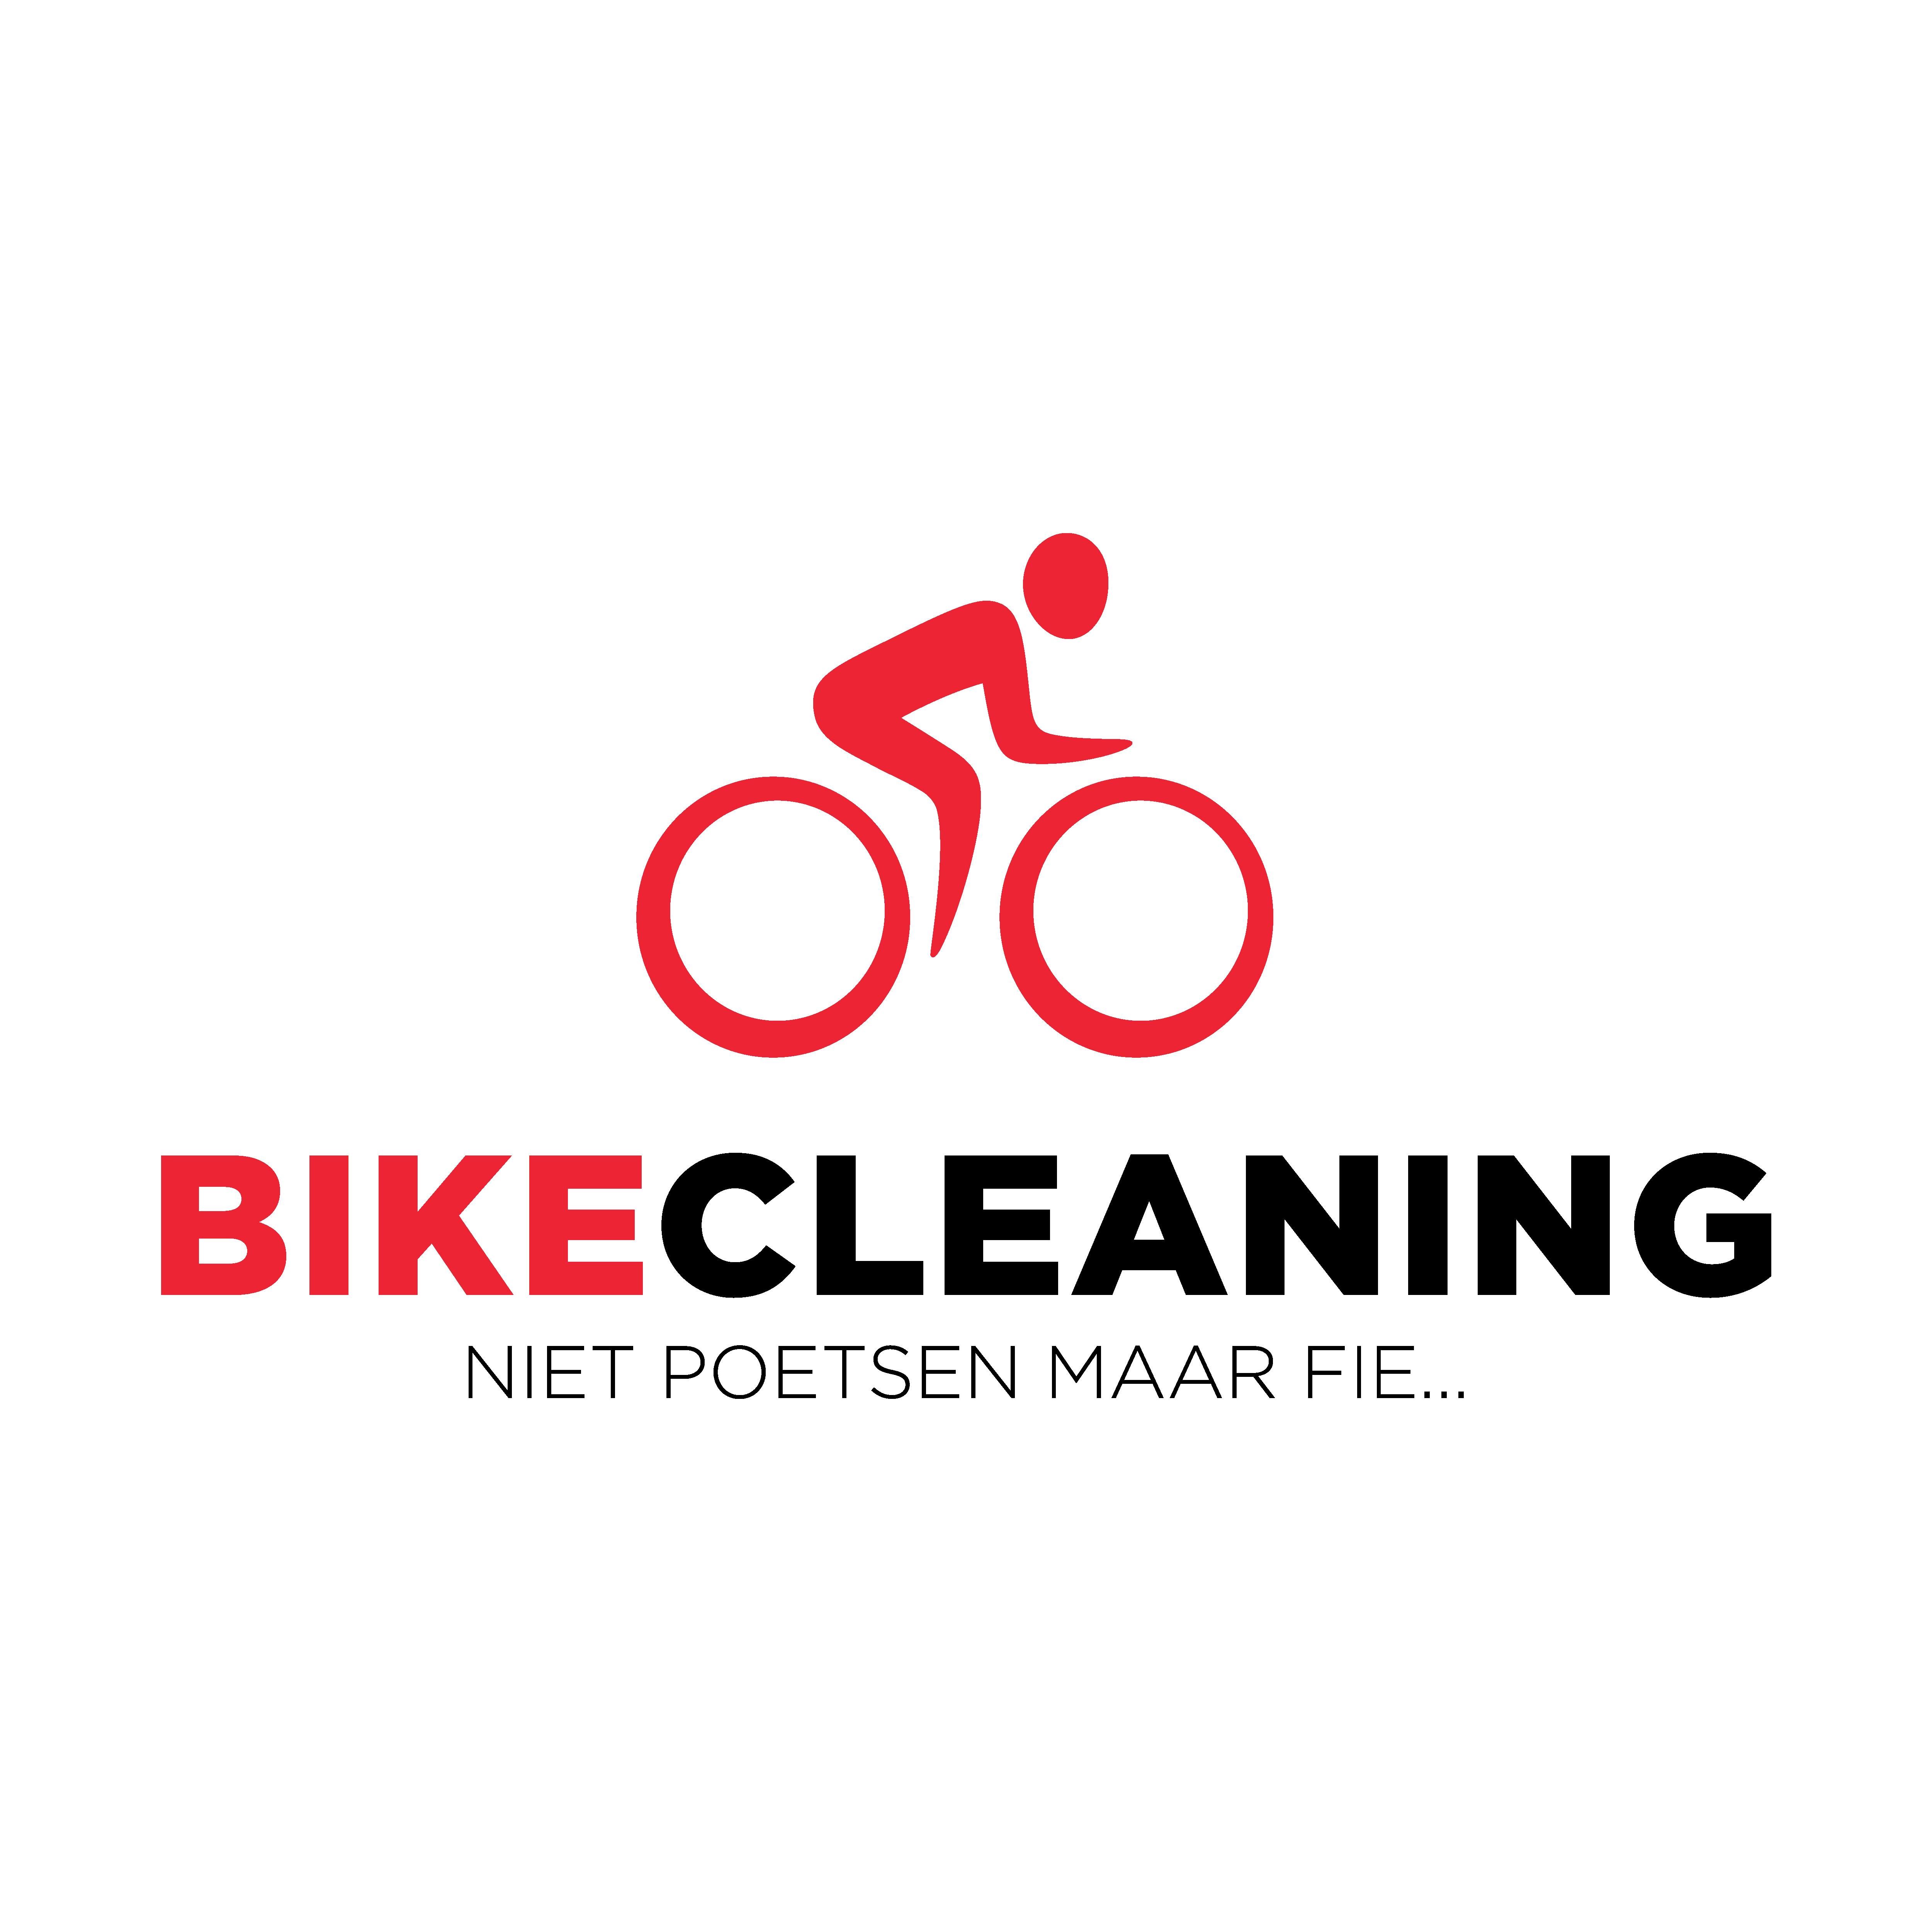 Bikecleaning_Logo_Varianten-04